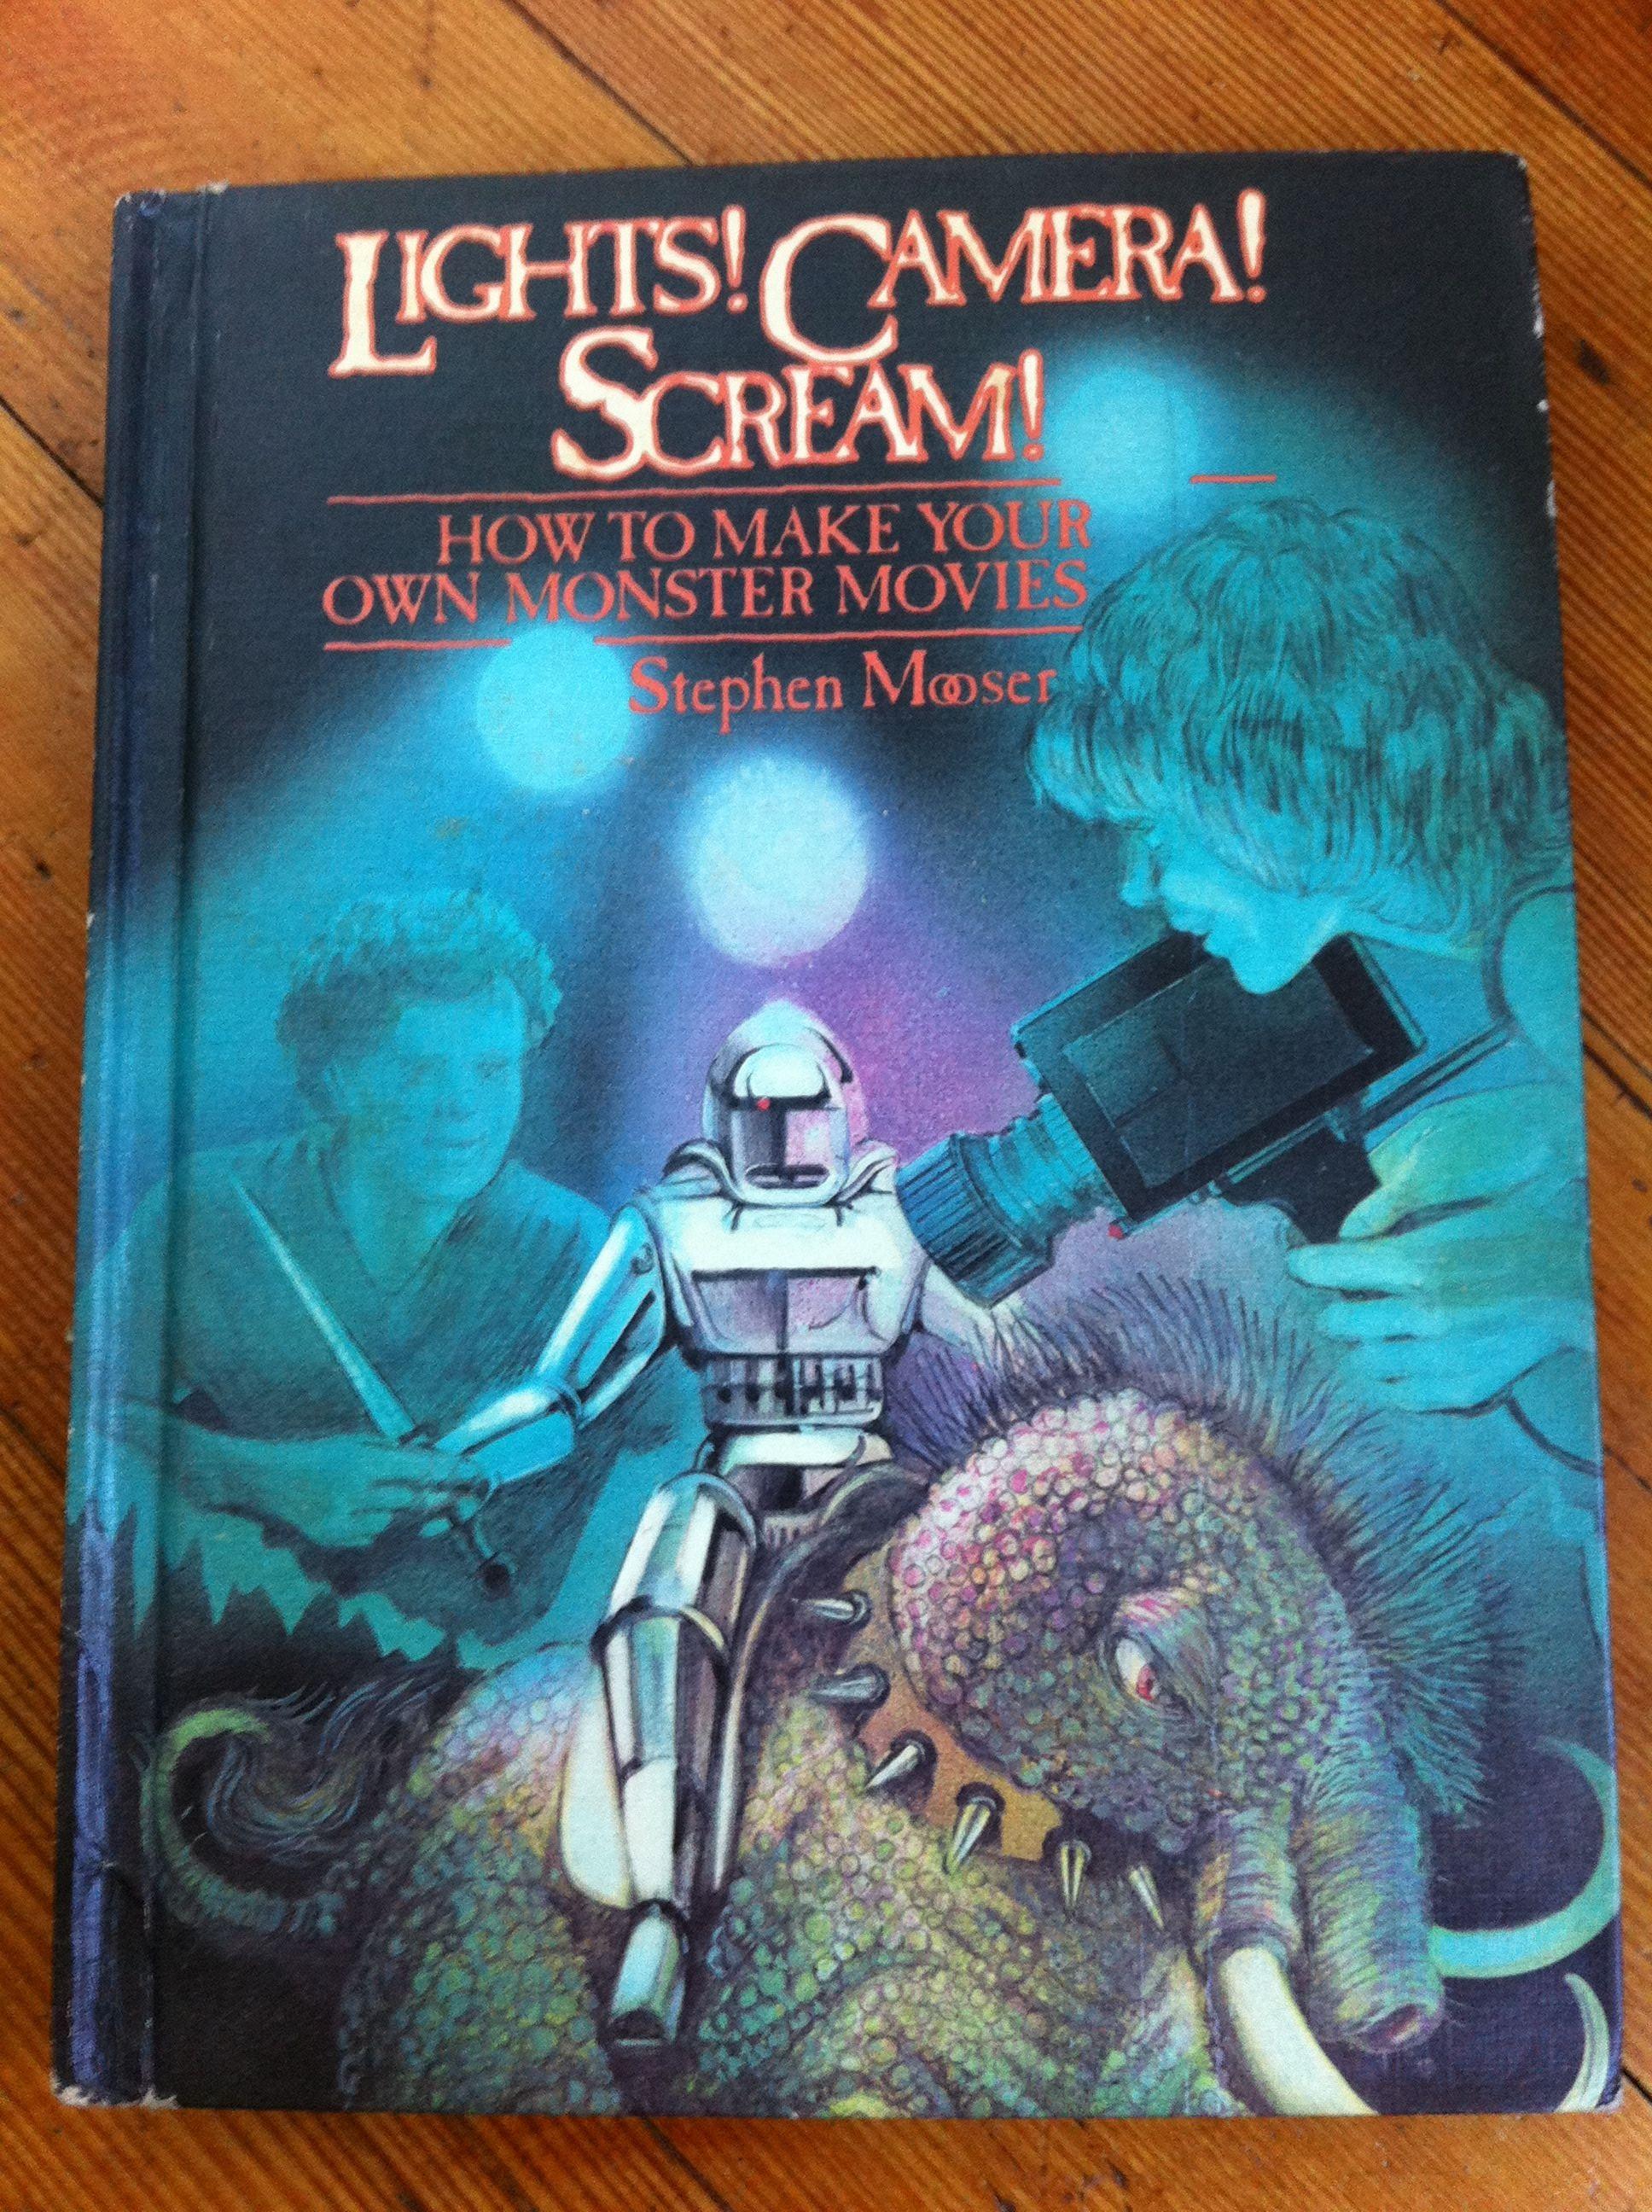 My favorite book, back in 1983